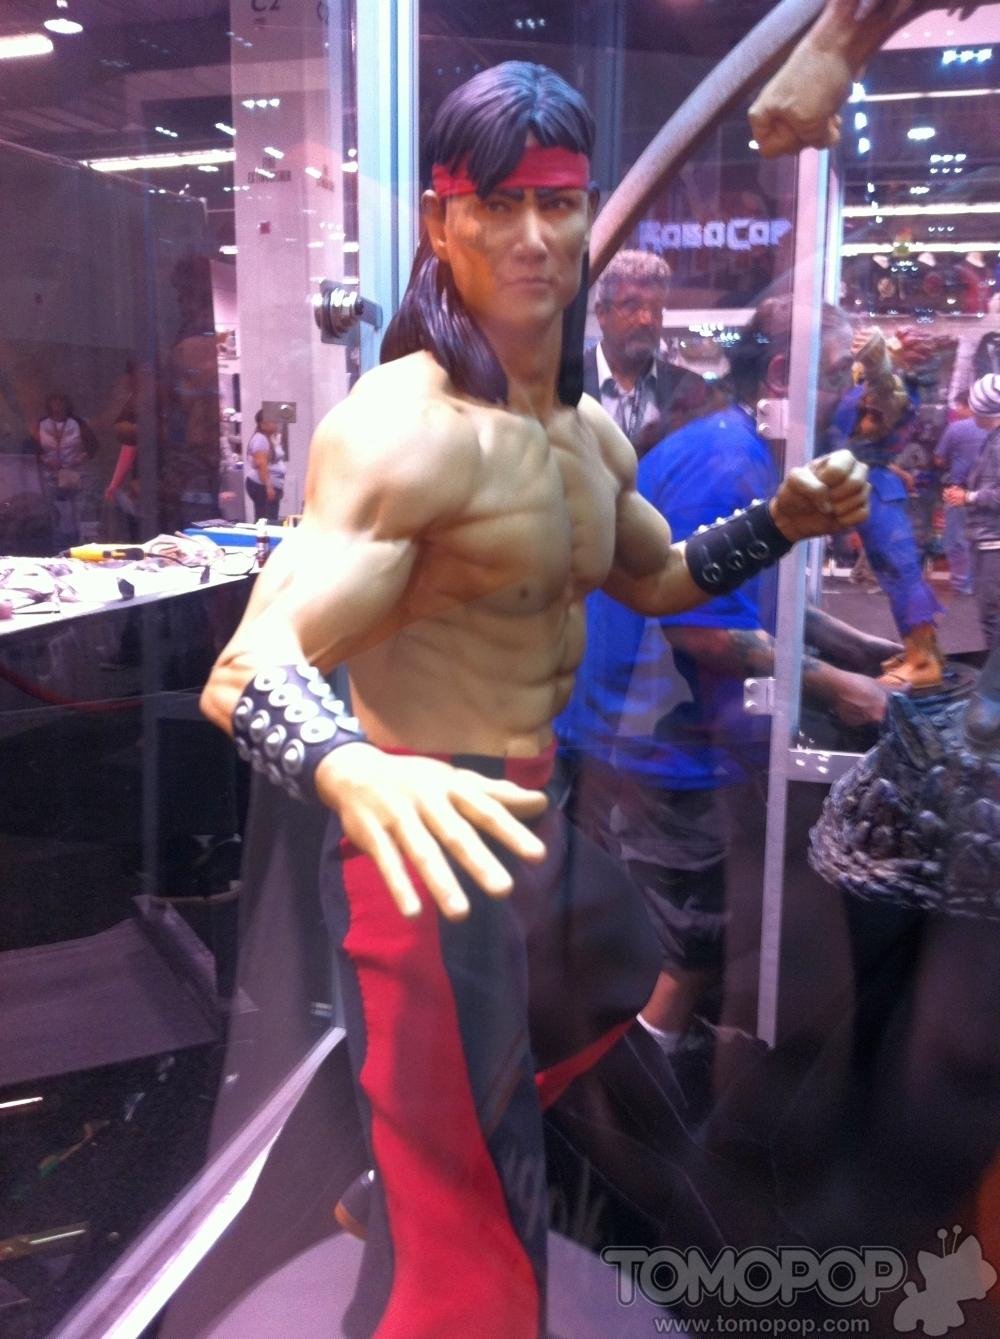 [Pop Culture Shock] Mortal Kombat: Liu Kang 1/4 scale - Página 2 PCS-Mortal-Kombat-Statues-004